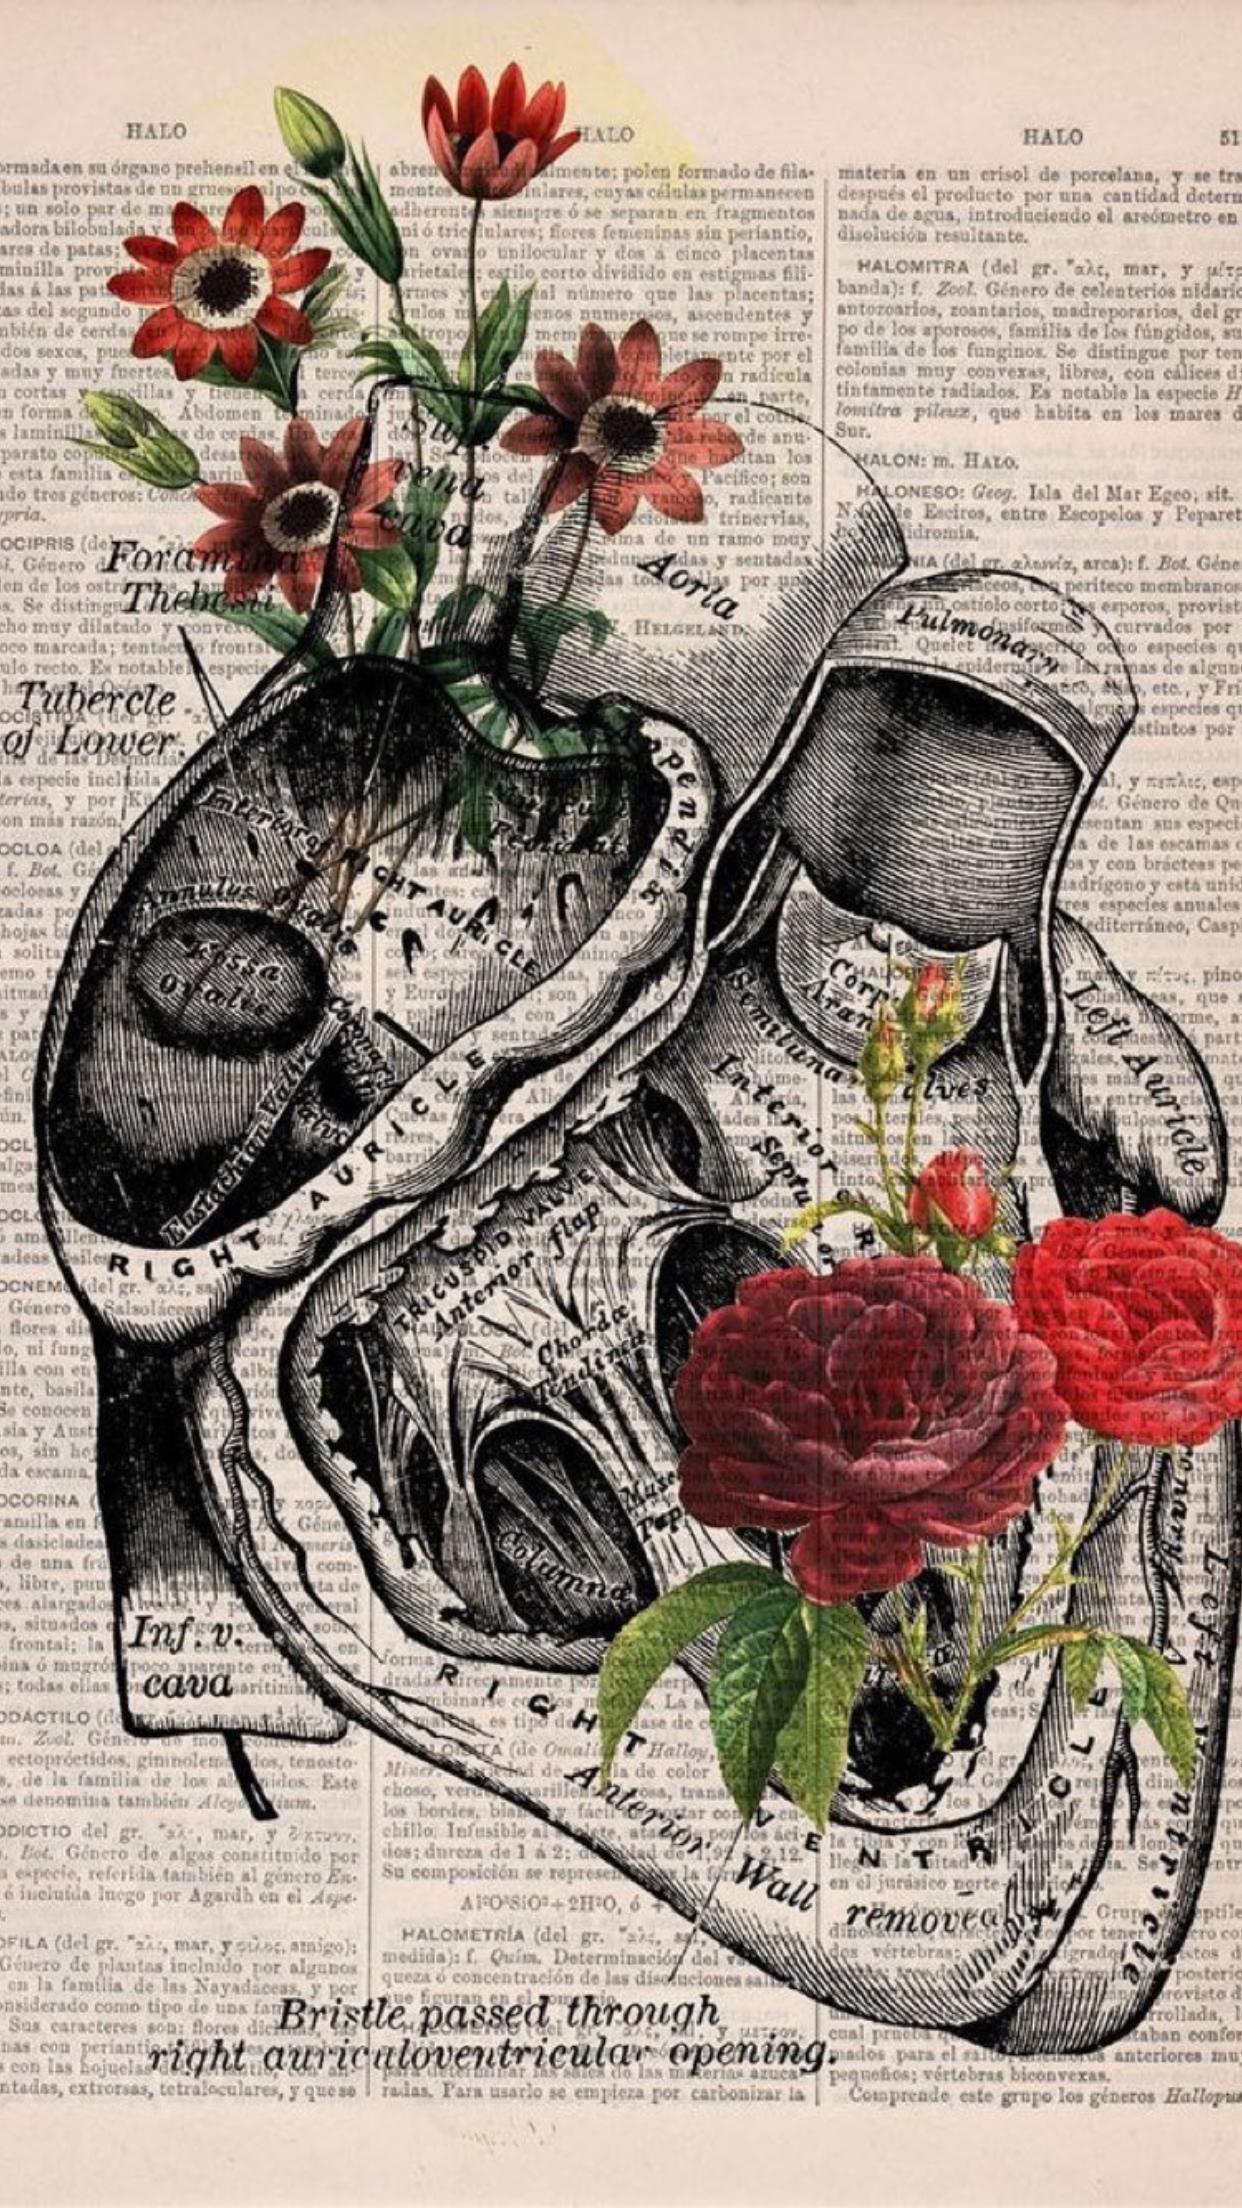 Pin by Gabi Maul on Tattoos | Pinterest | Wallpaper, Artistic ...